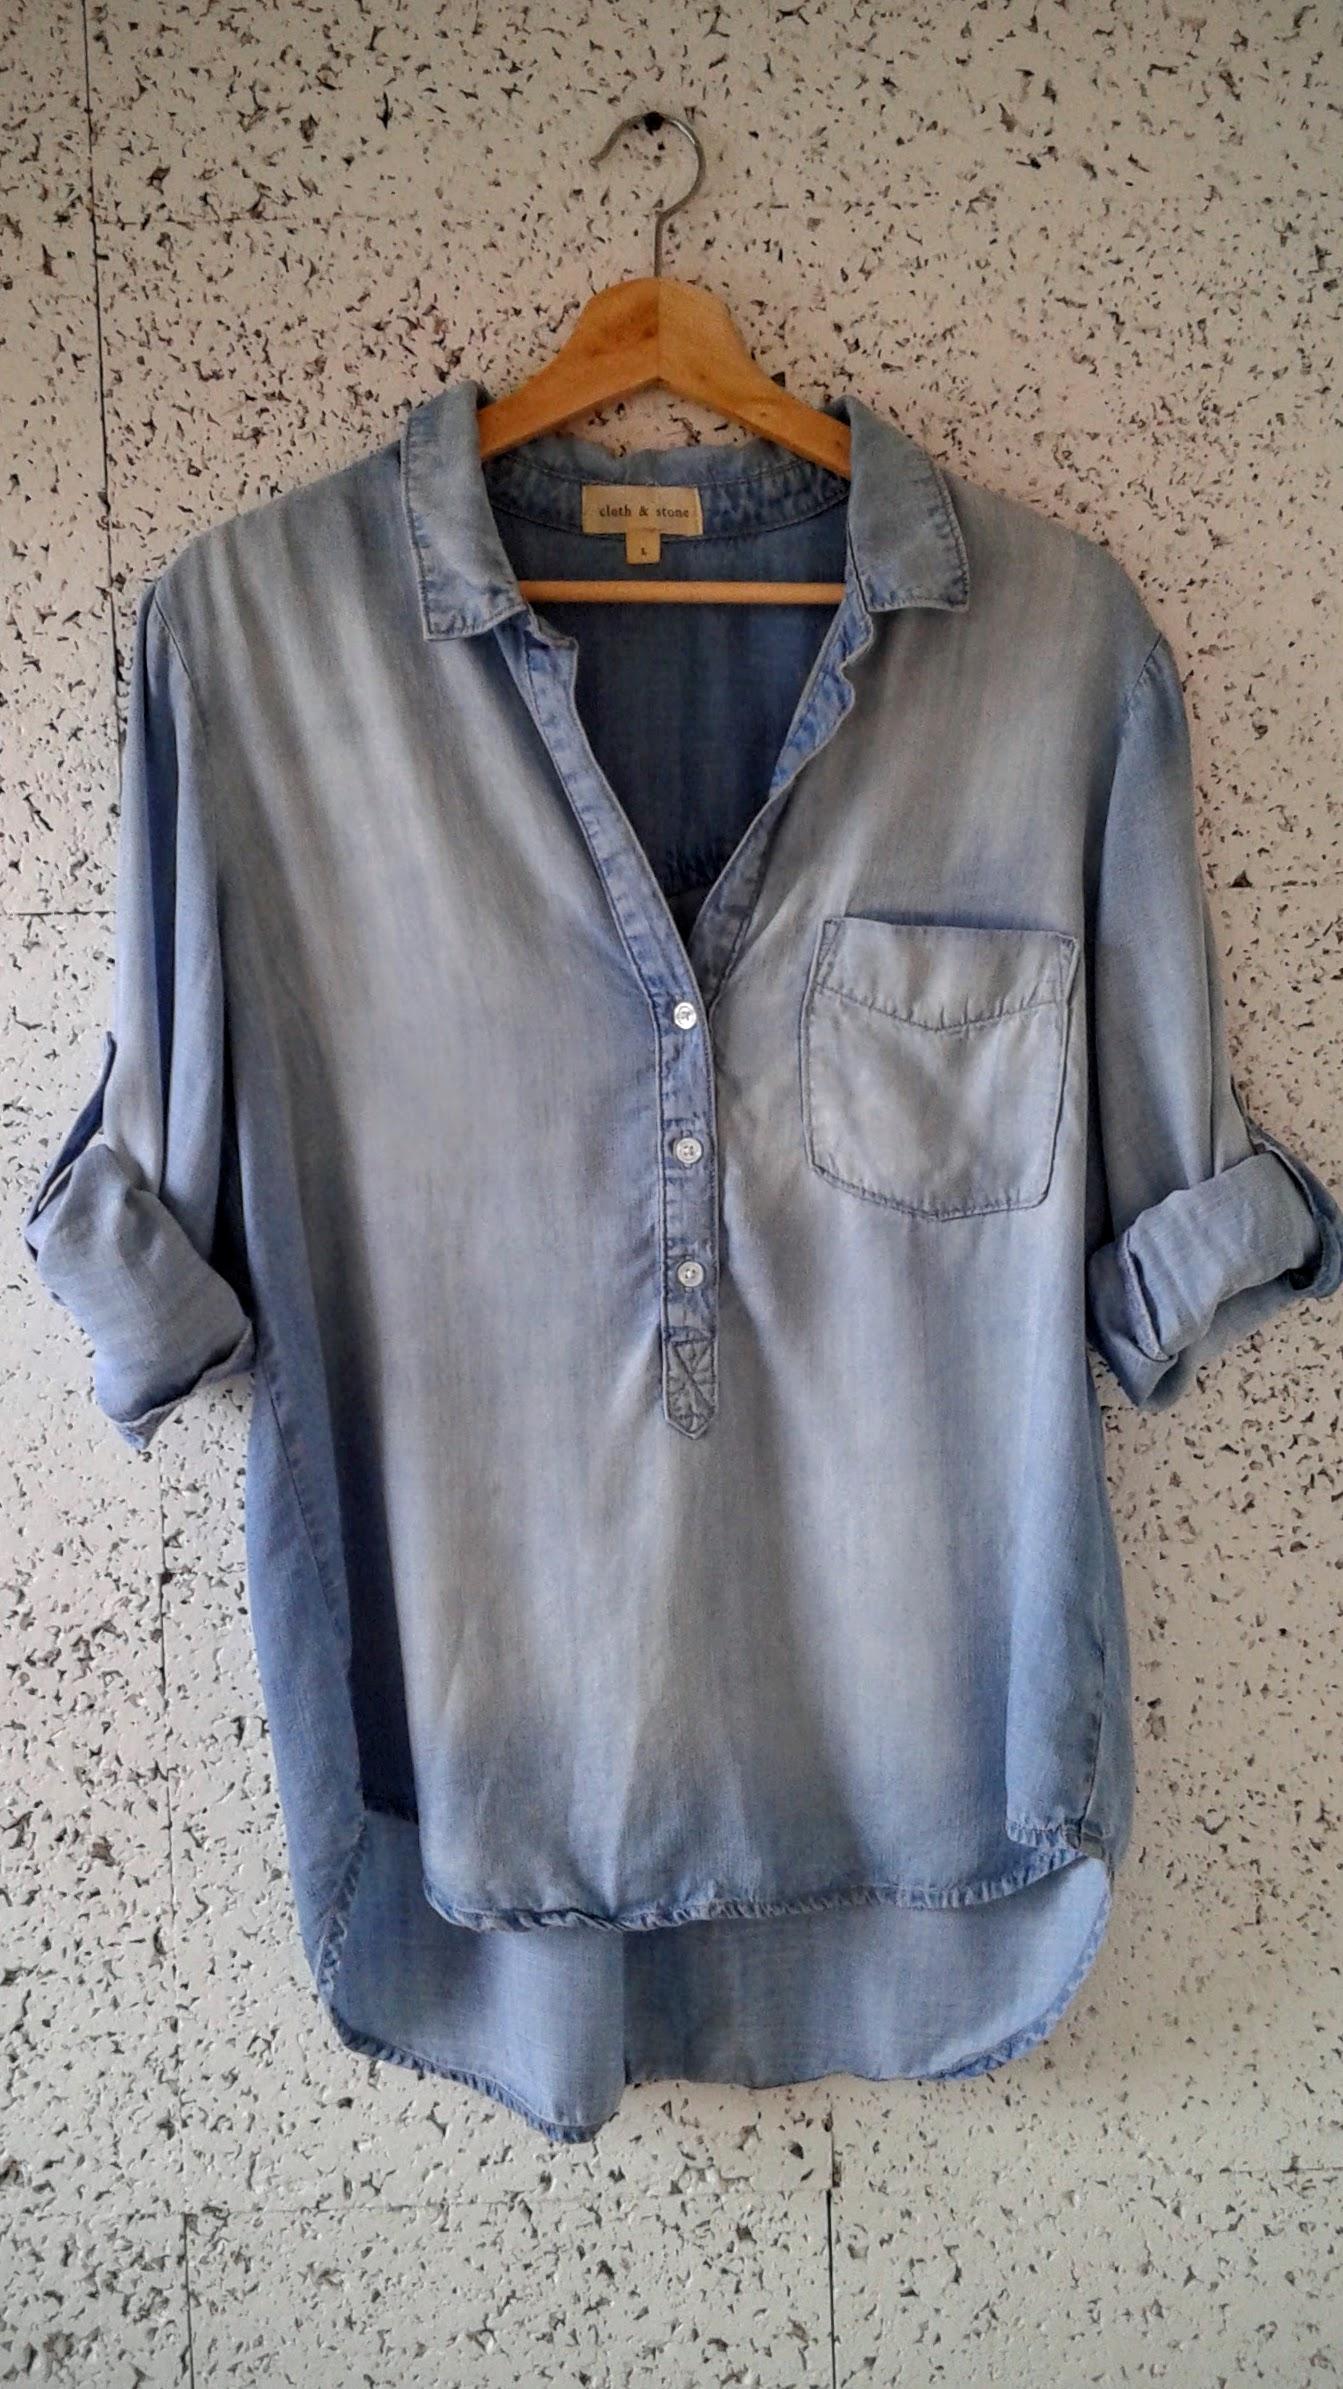 Cloth+Stone top; Size L, $28